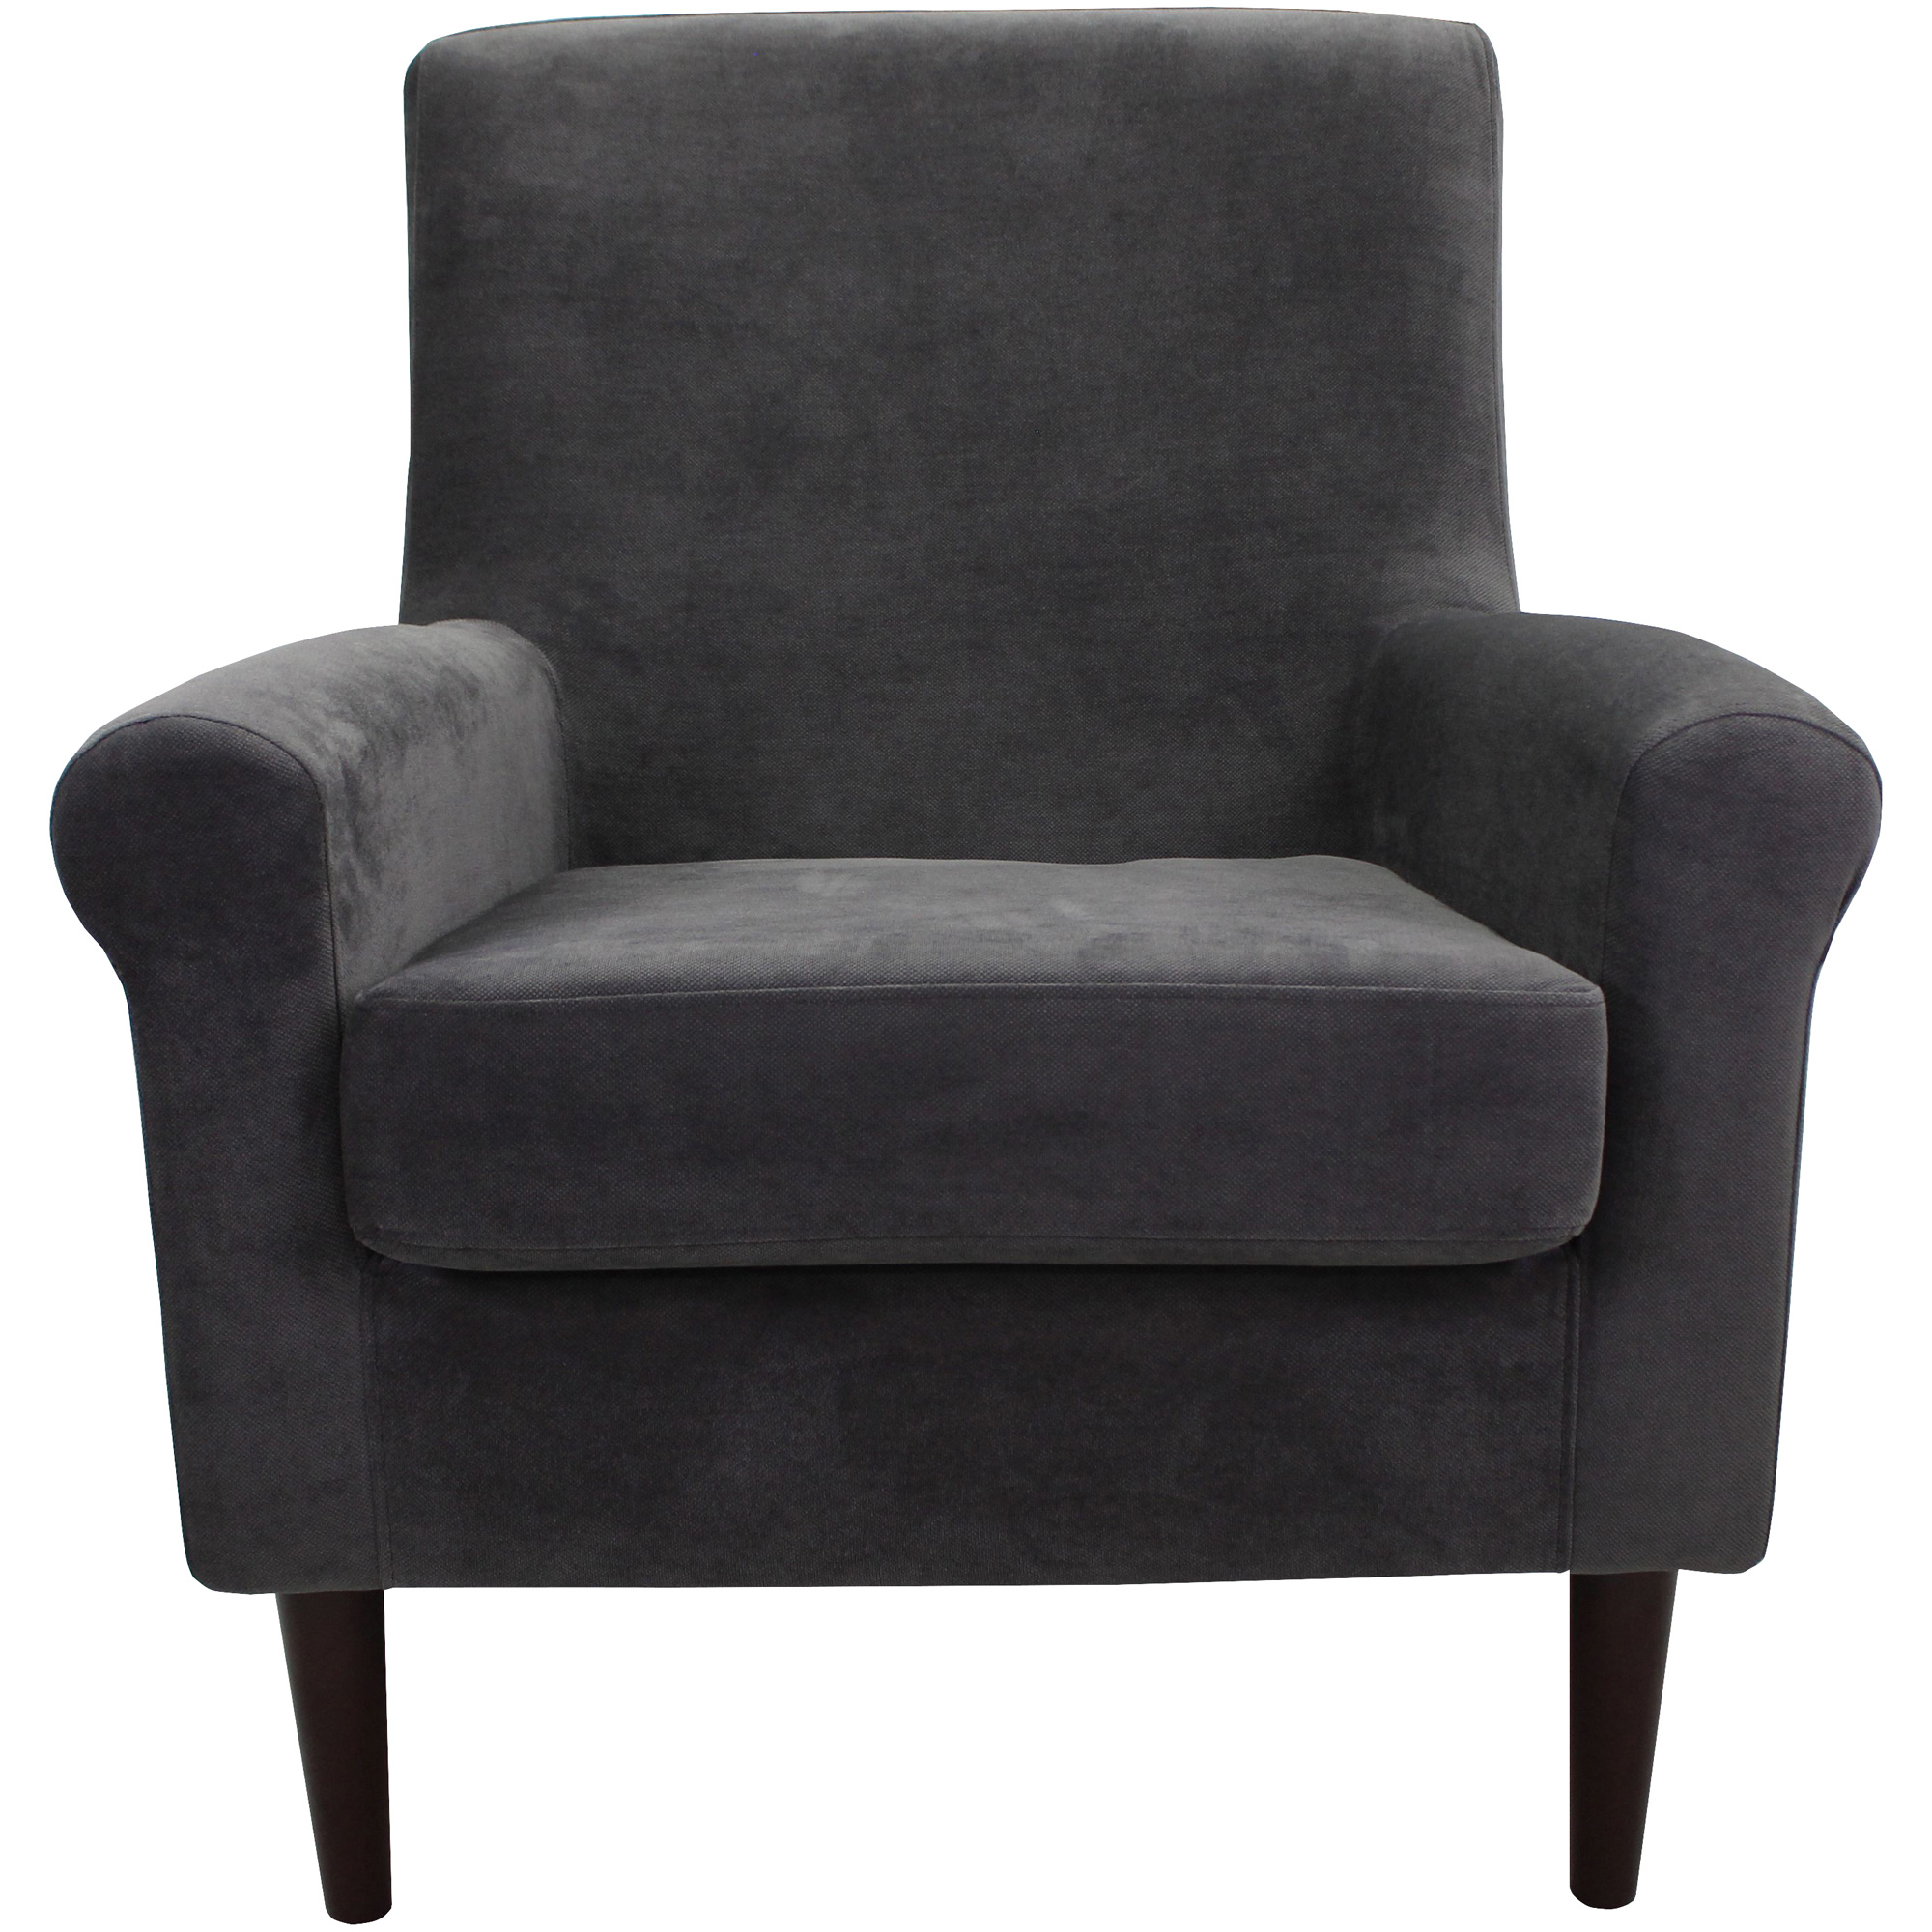 Overman | Ellis Dark Gray Accent Chair